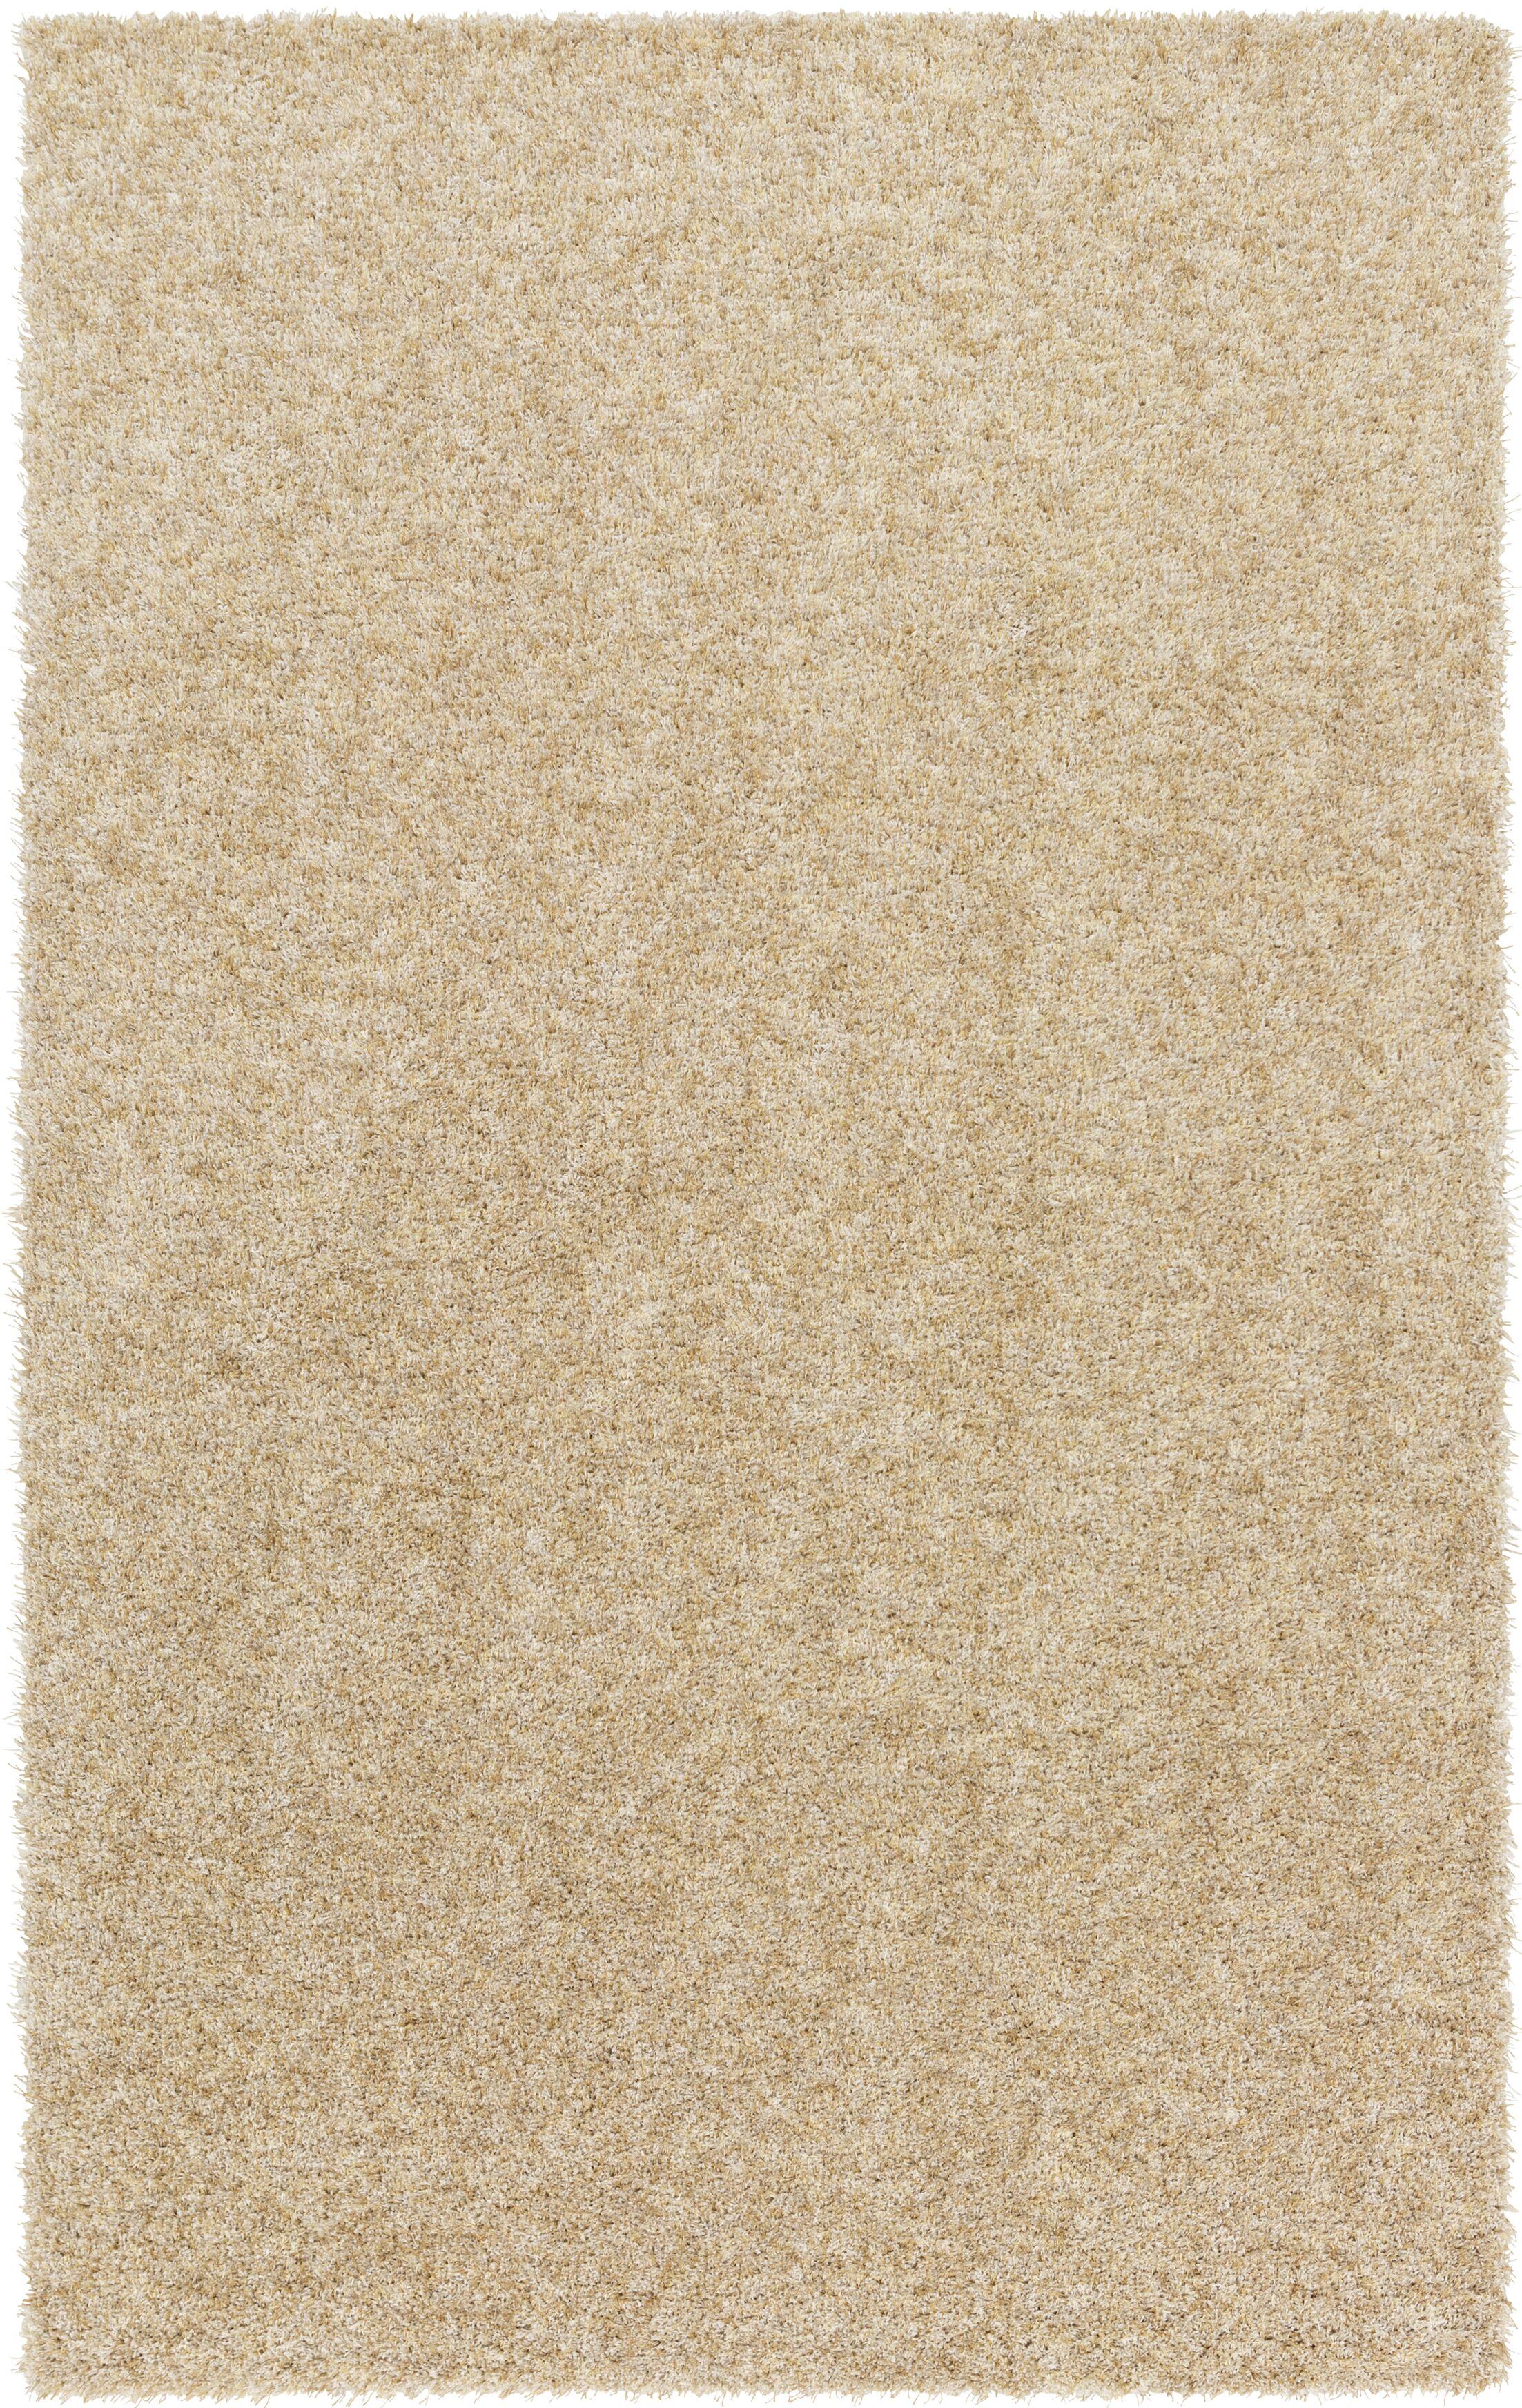 Dulcia Beige Area Rug Rug Size: Rectangle 6' x 9'